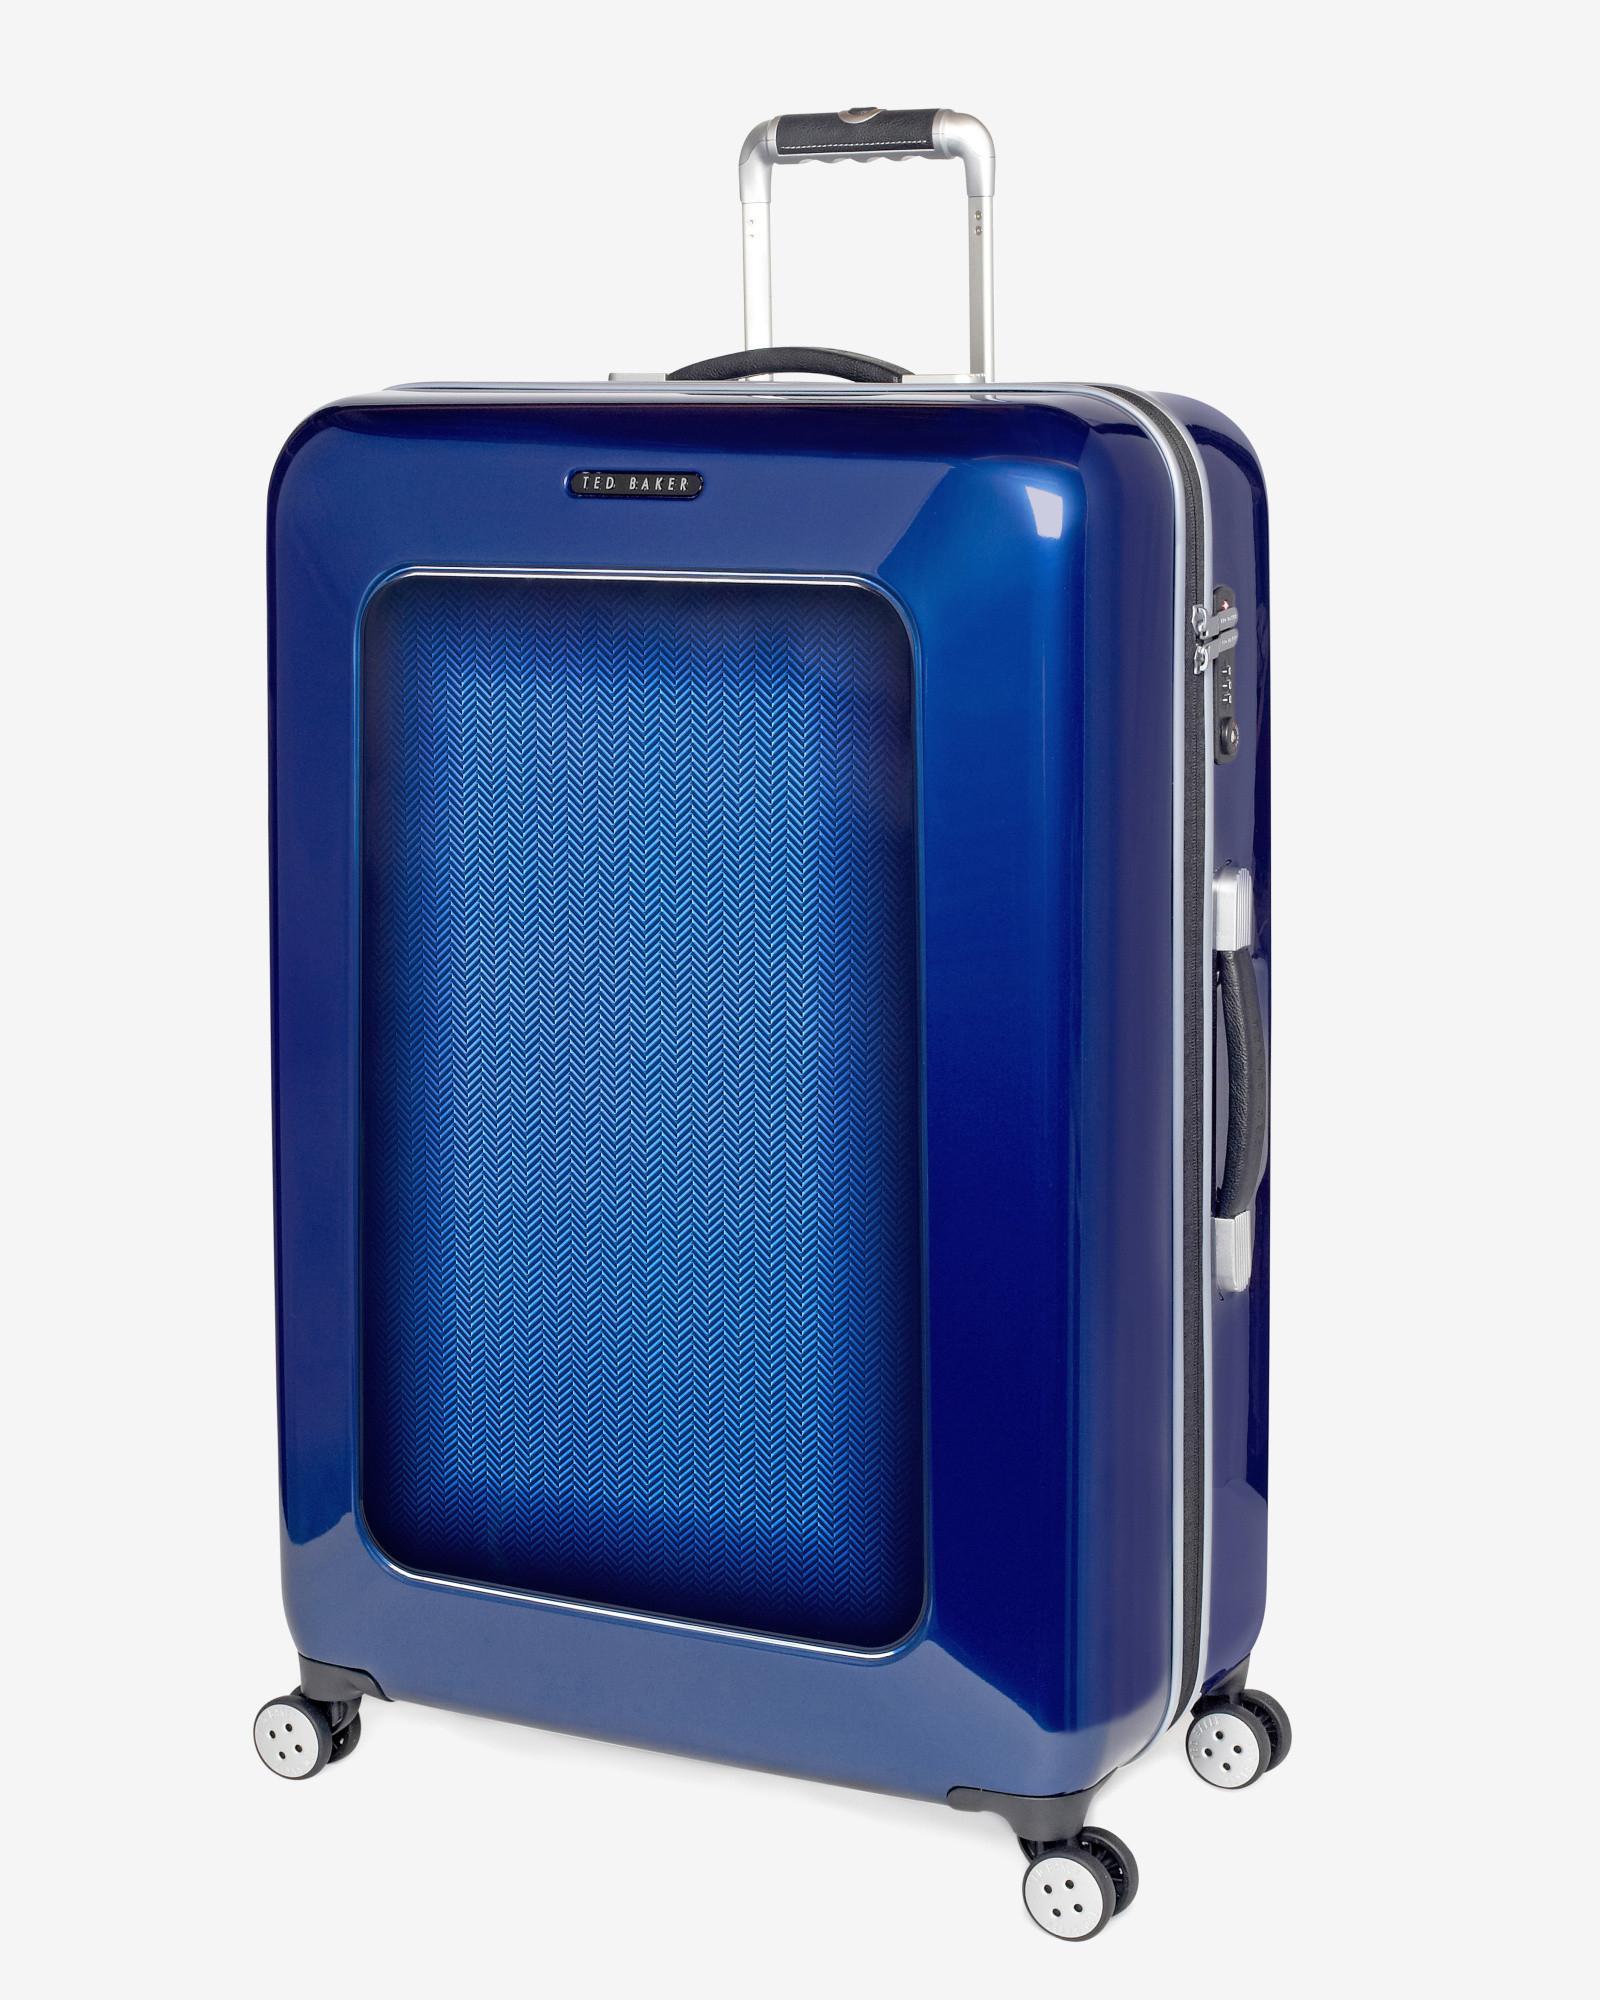 Ted baker Herringbone 4-Wheel 79.5Cm Large Suitcase in Blue for ...